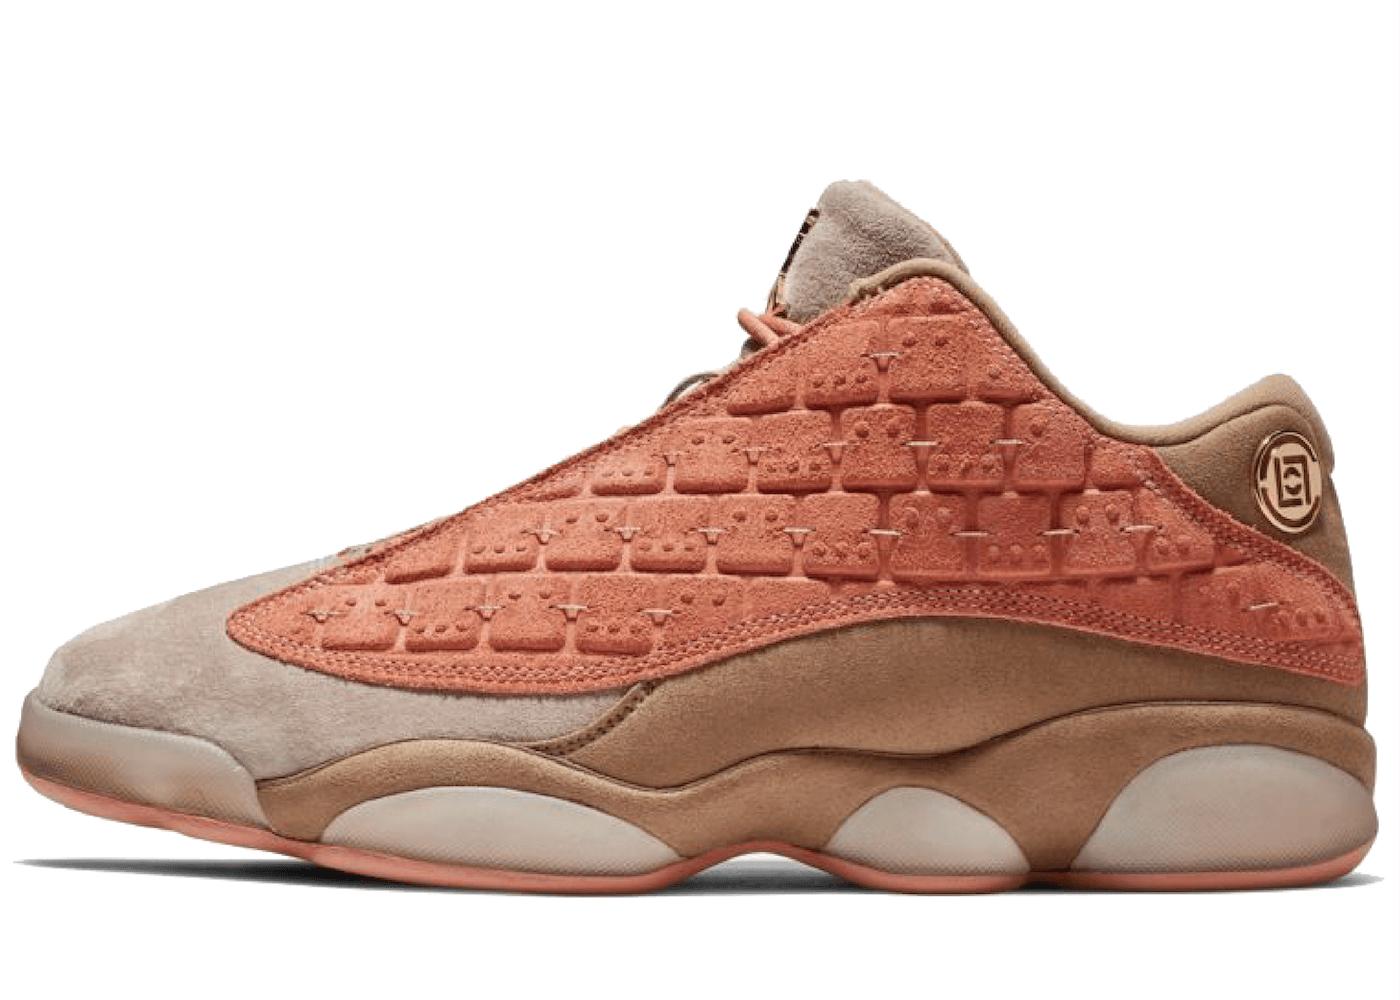 Nike Air Jordan 13 Retro Low Clot Sepia Stoneの写真